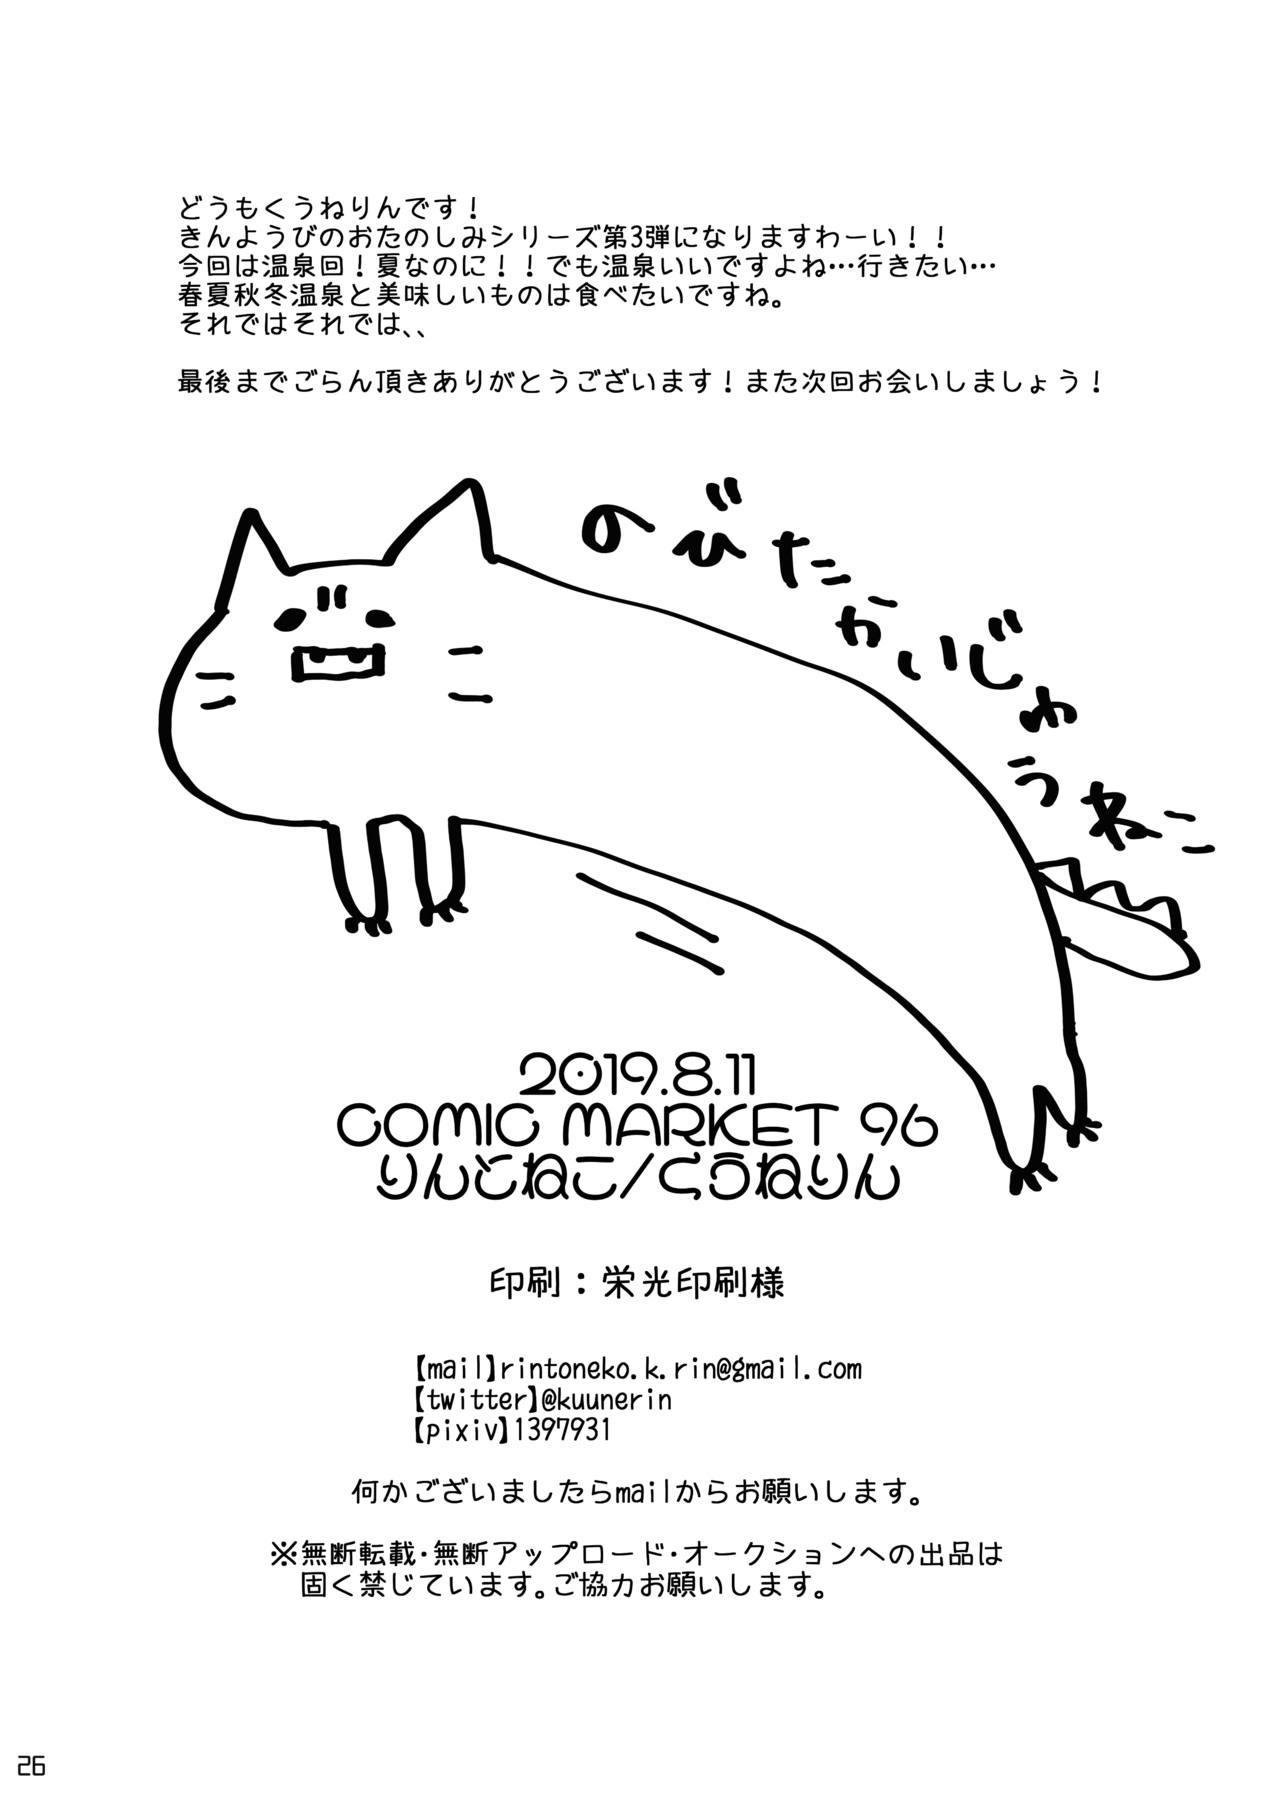 Kinyoubi no Otanoshimi 24